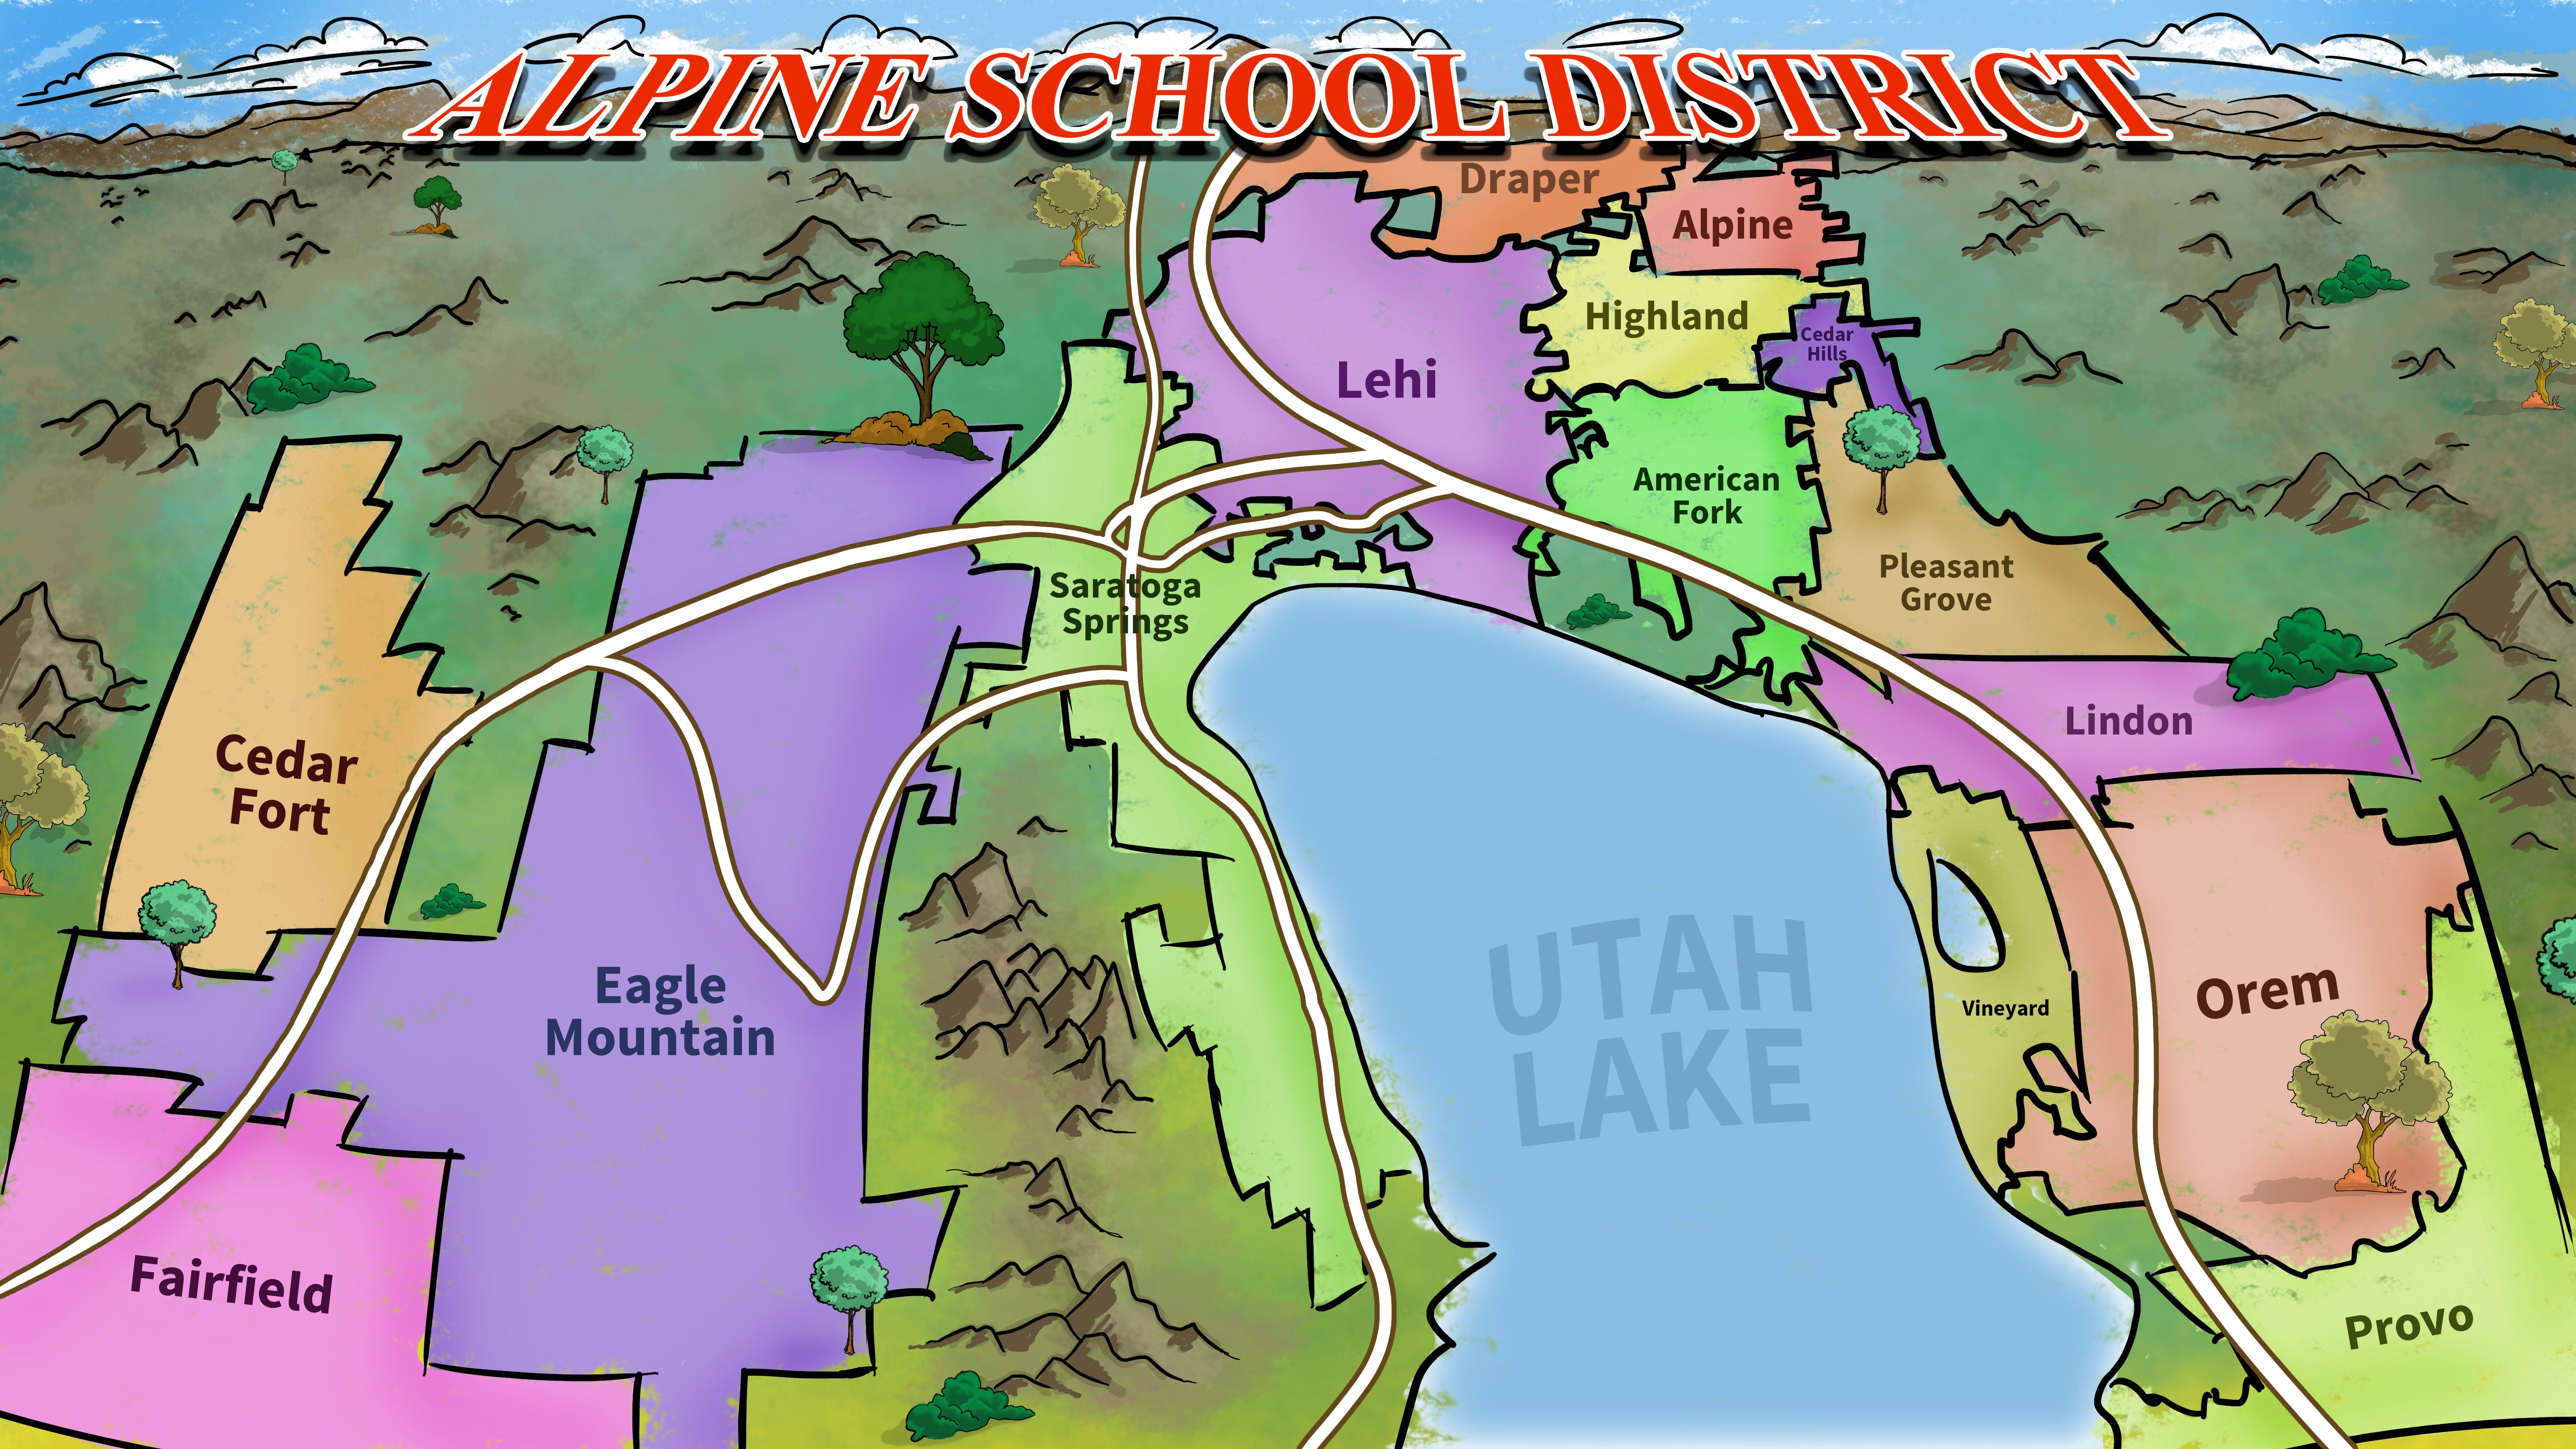 Alpine School District - Final District Map 03